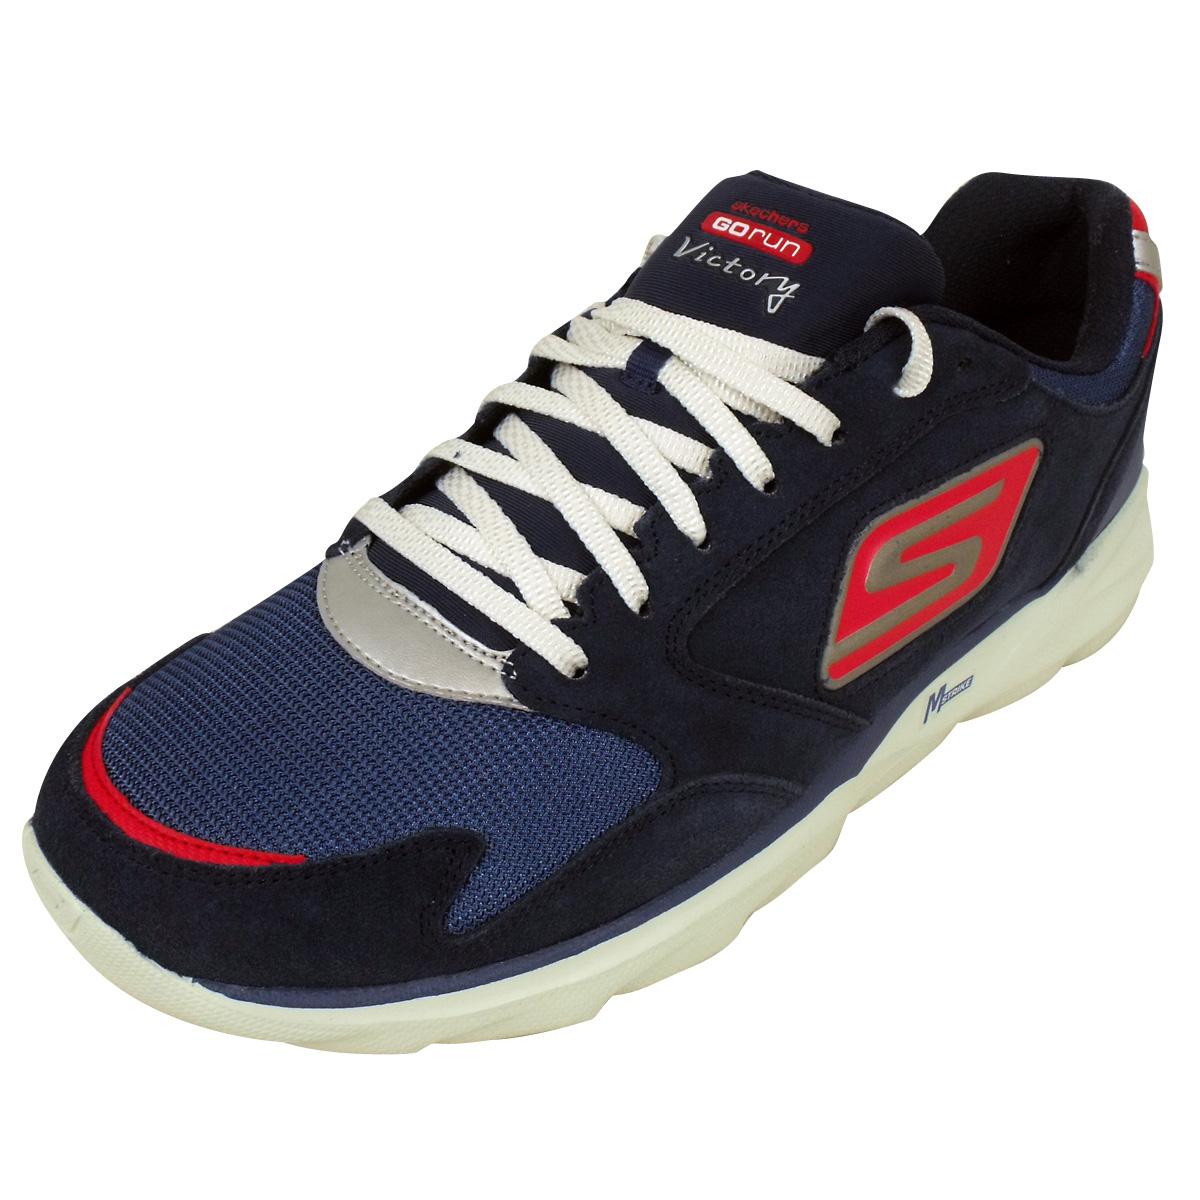 Skechers Gorun Sonic Victory Womens Running Shoes